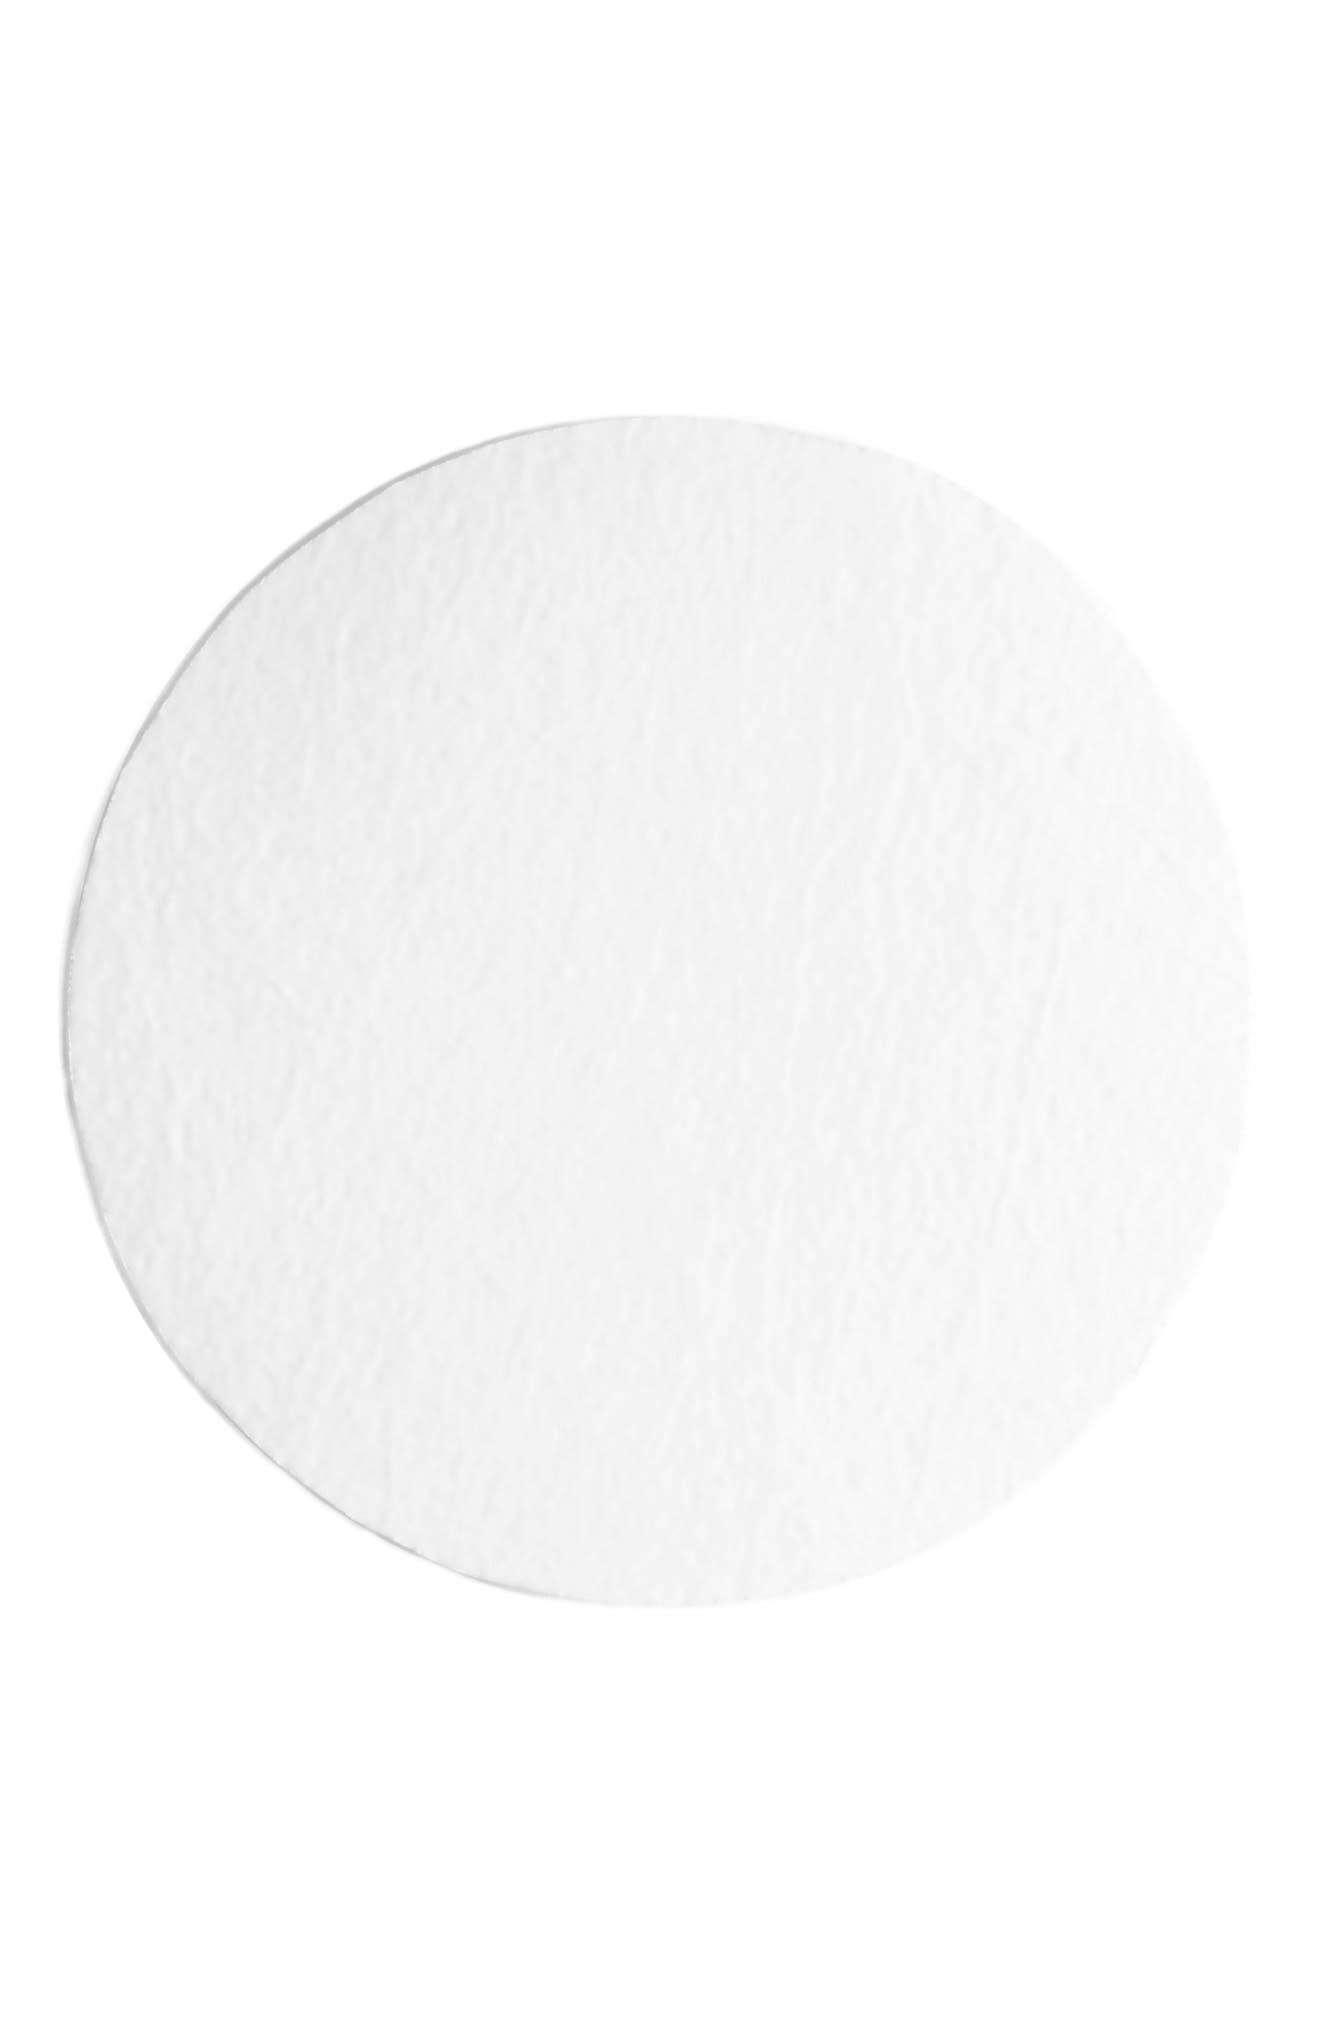 'Ferulic + Retinol' Wrinkle Recovery Peel,                             Alternate thumbnail 2, color,                             No Color